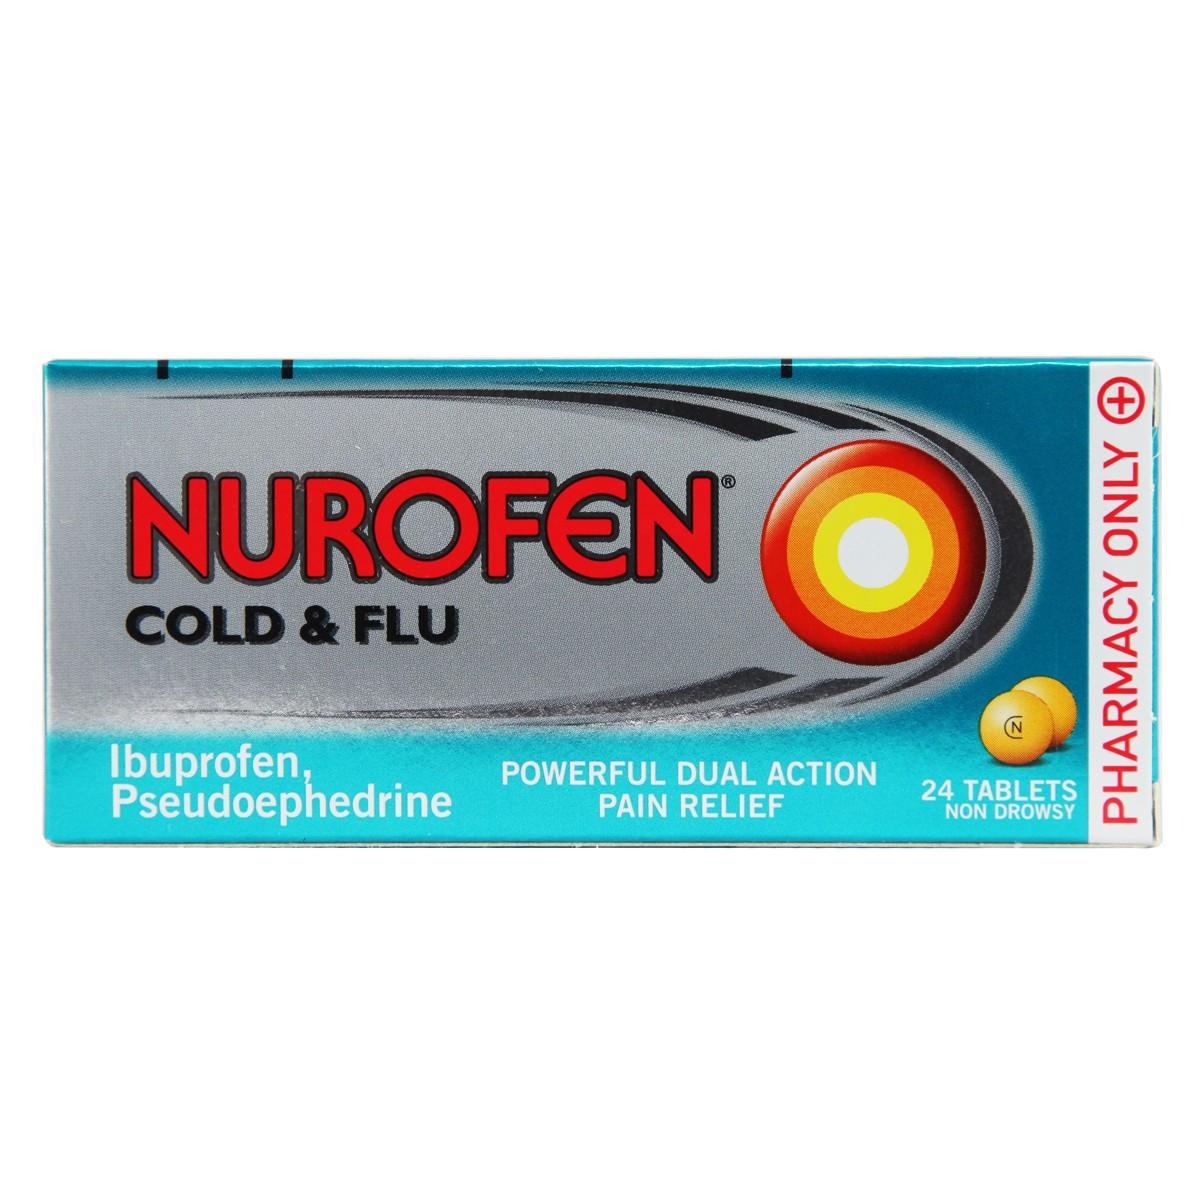 Nurofen Cold and Flu